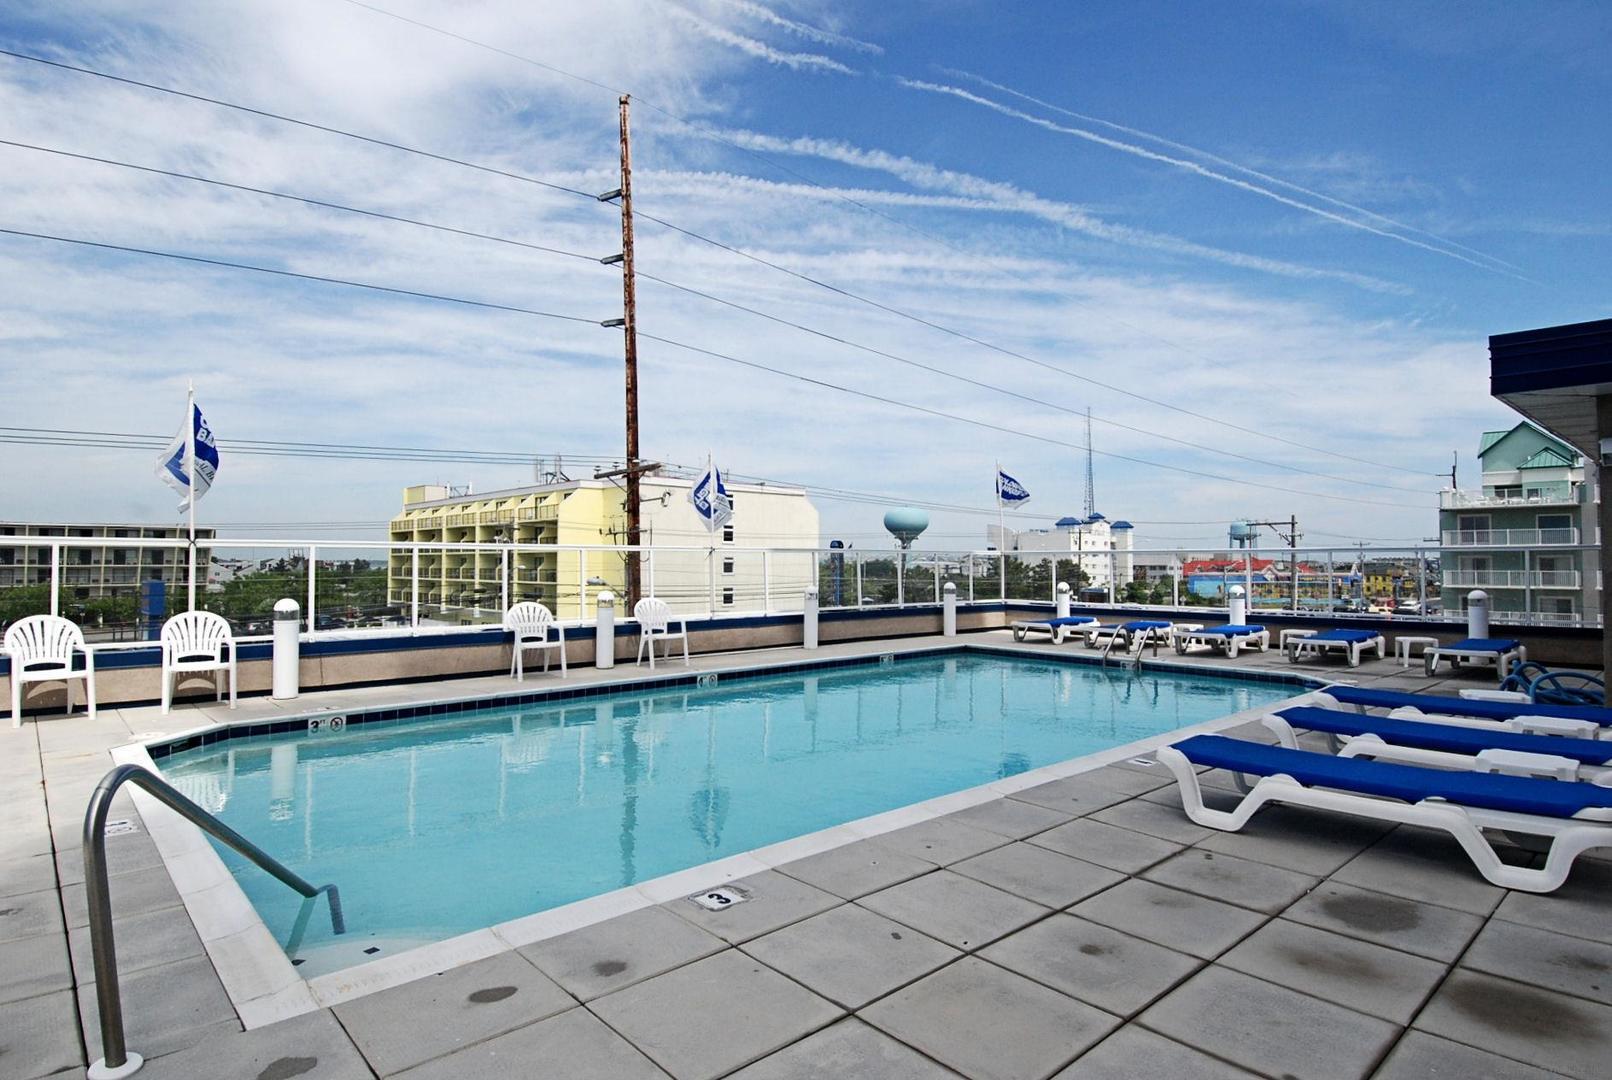 Meridian Rooftop Pool (open seasonally)